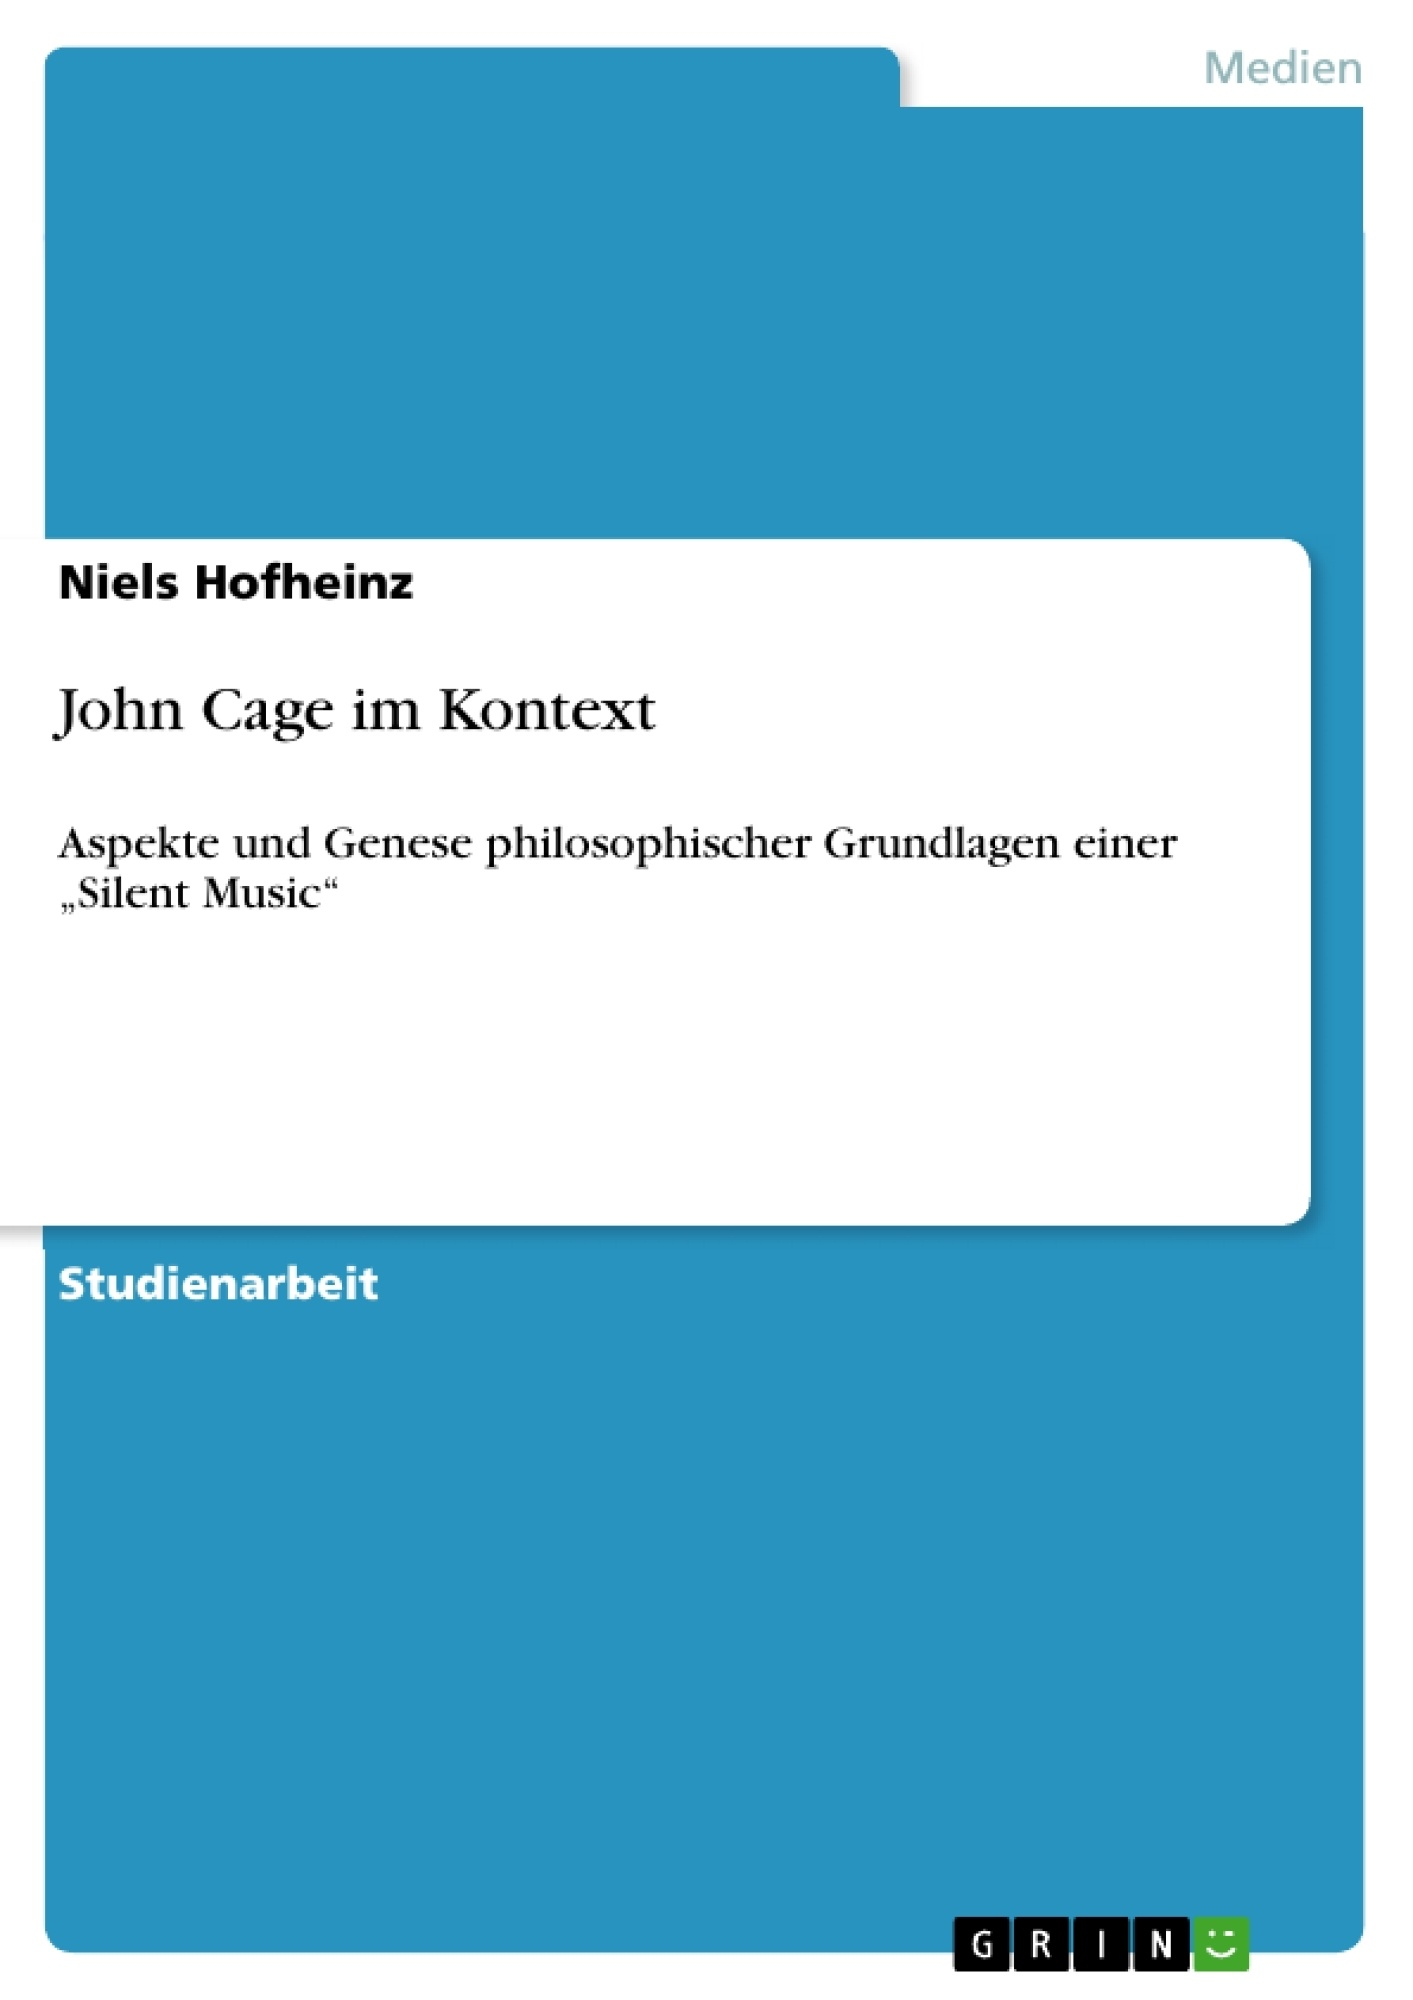 Titel: John Cage im Kontext